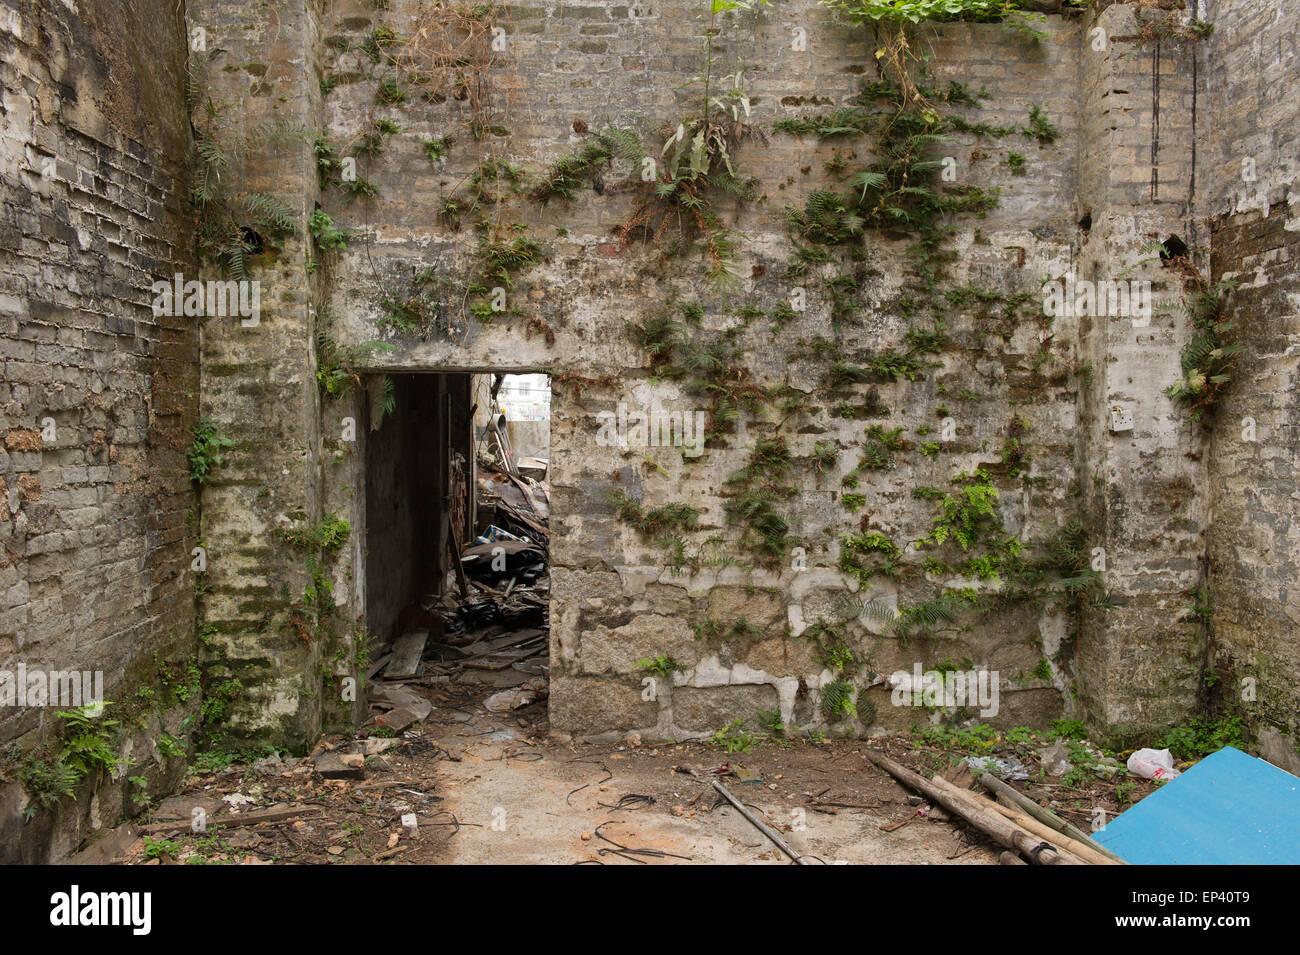 Abandoned structure, Tai O fishing Village located on Lantau Island, Hong Kong, China - Stock Image